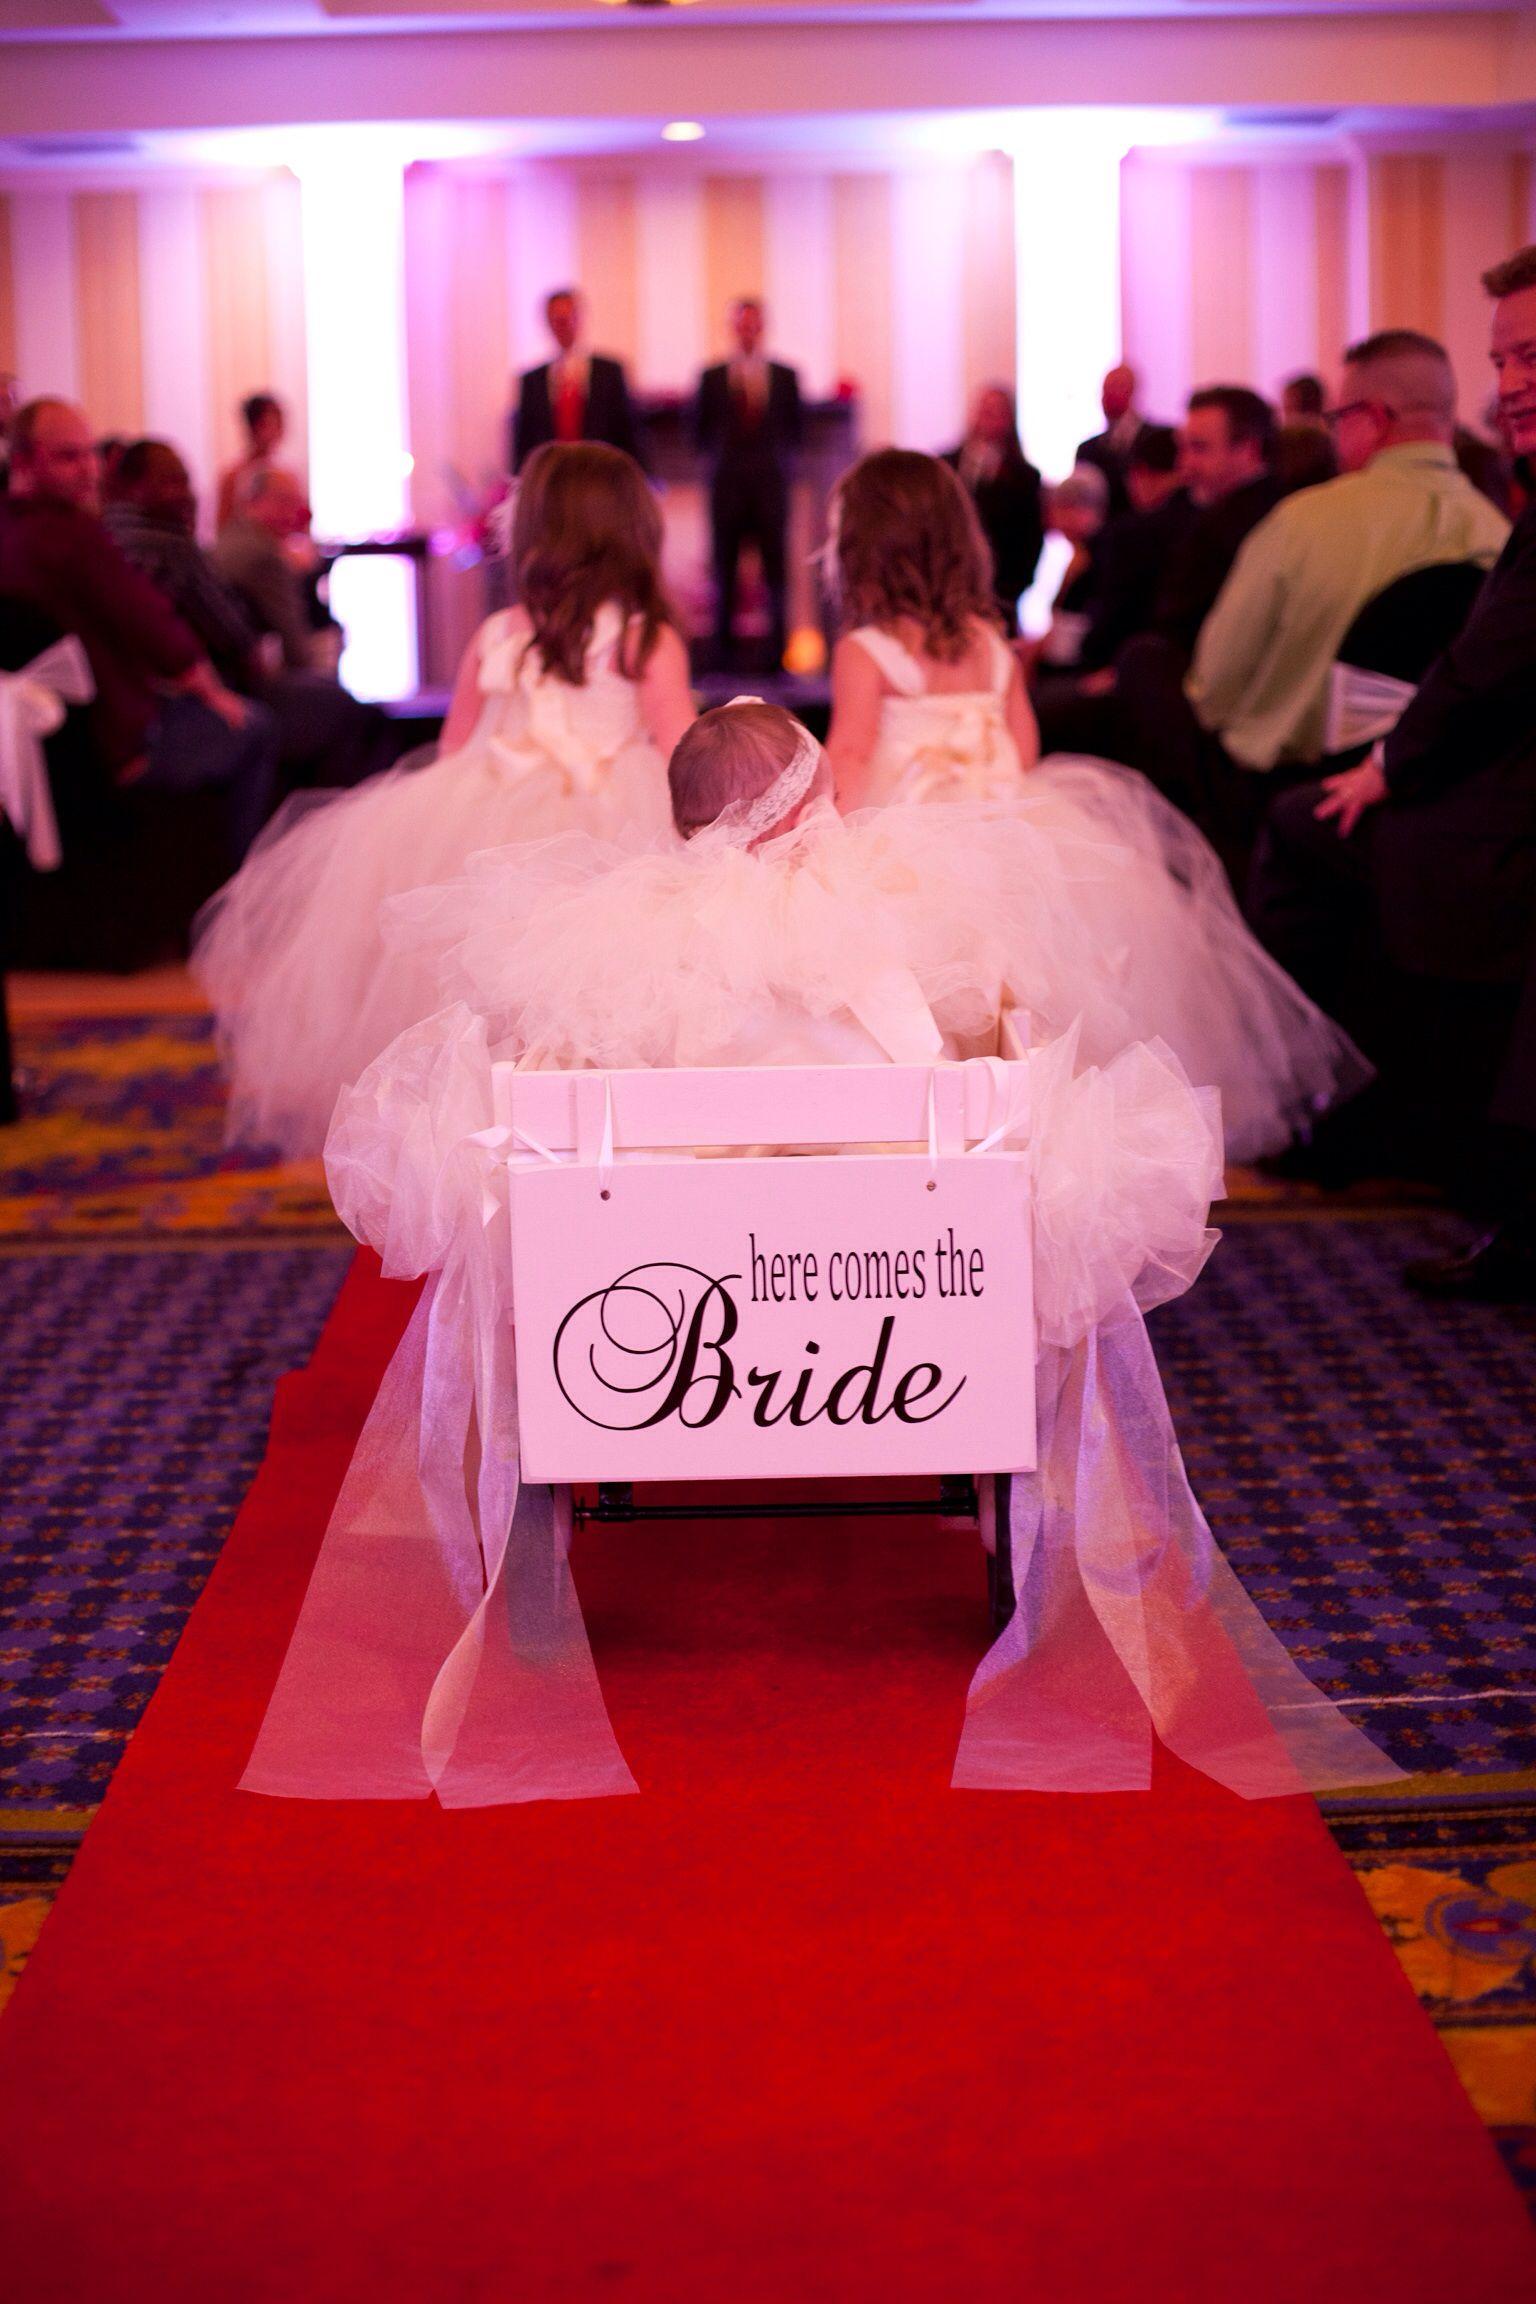 Ring Bearer Wagon | Wagon for wedding, Flower girl wagon ... |Flower Girl Wagon Wedding Party